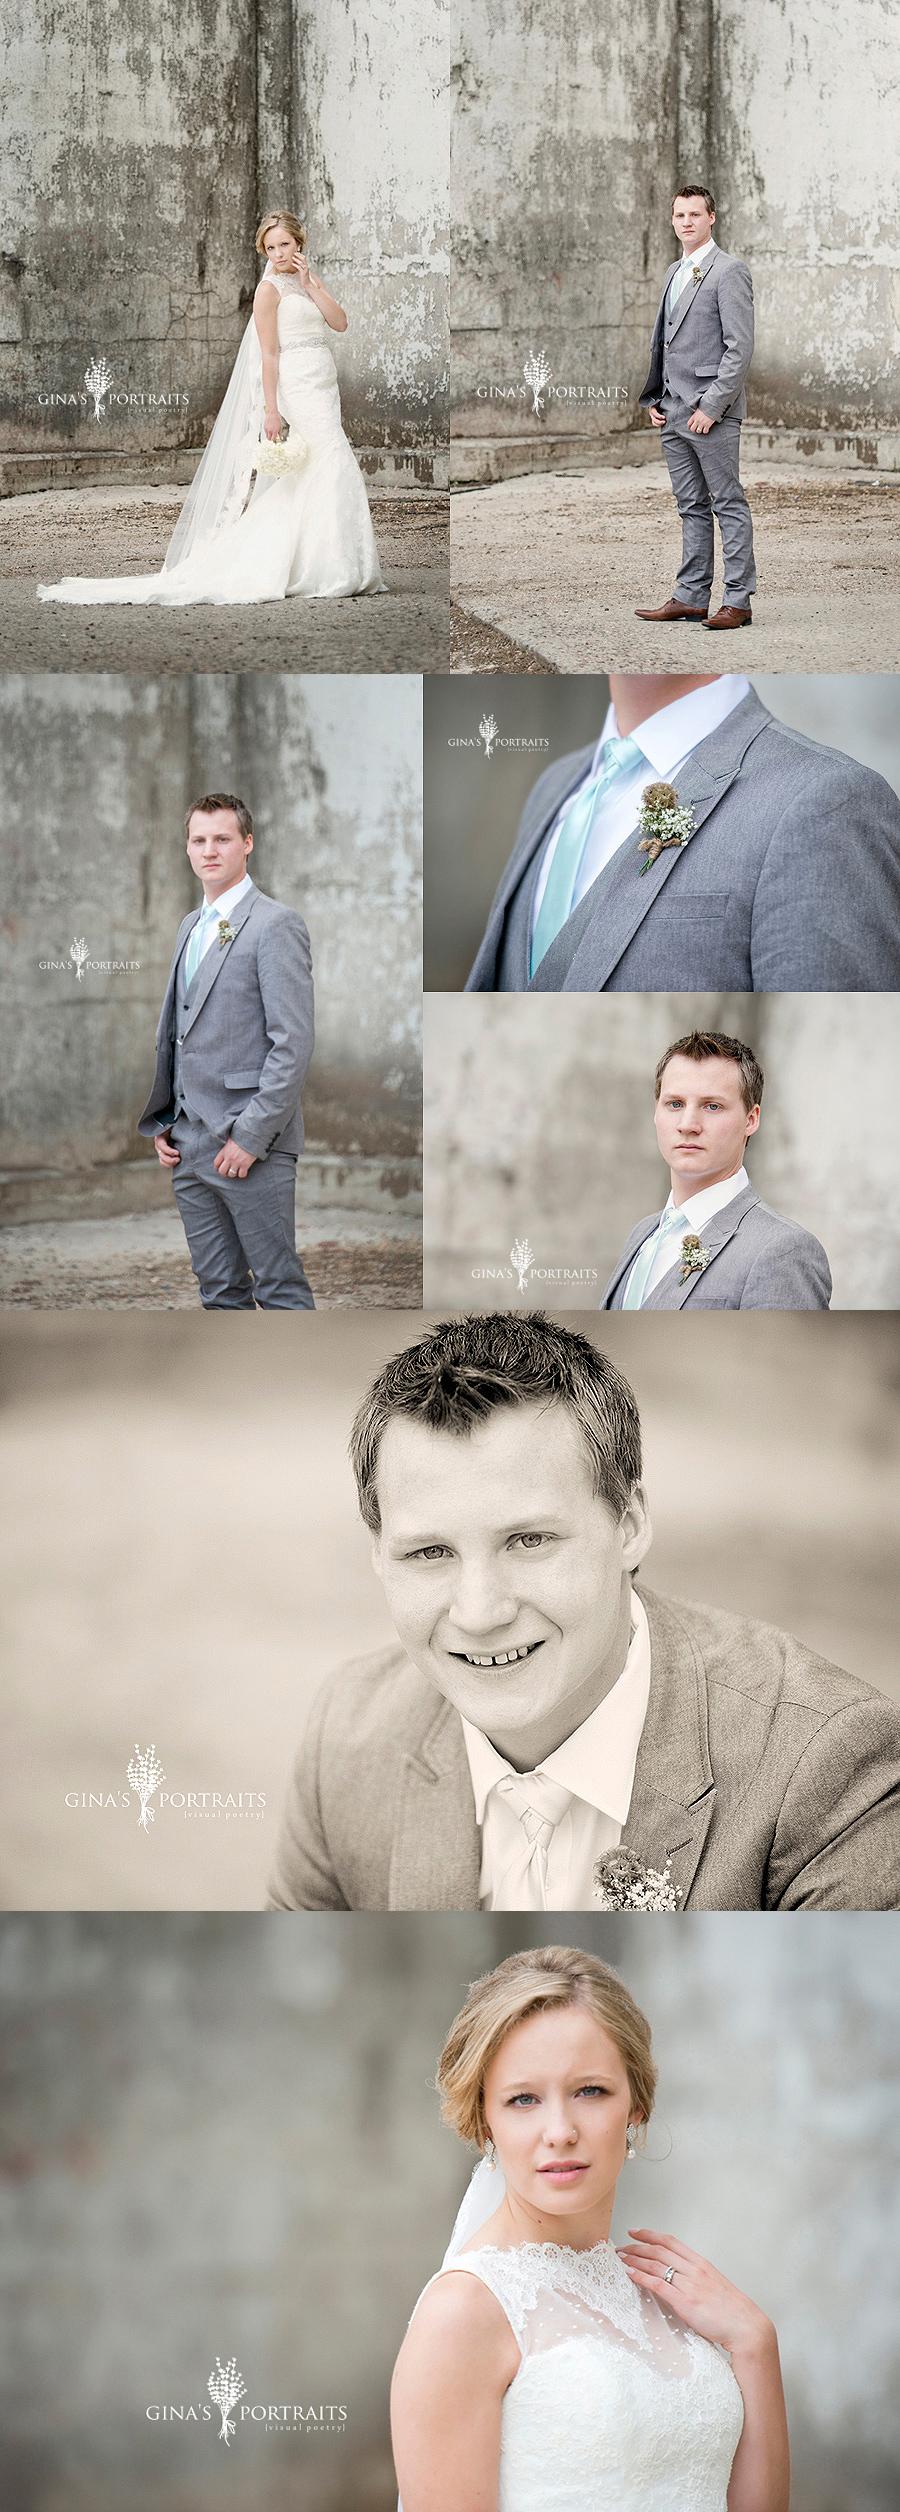 Saskatoon_Wedding_Photographer_comp019